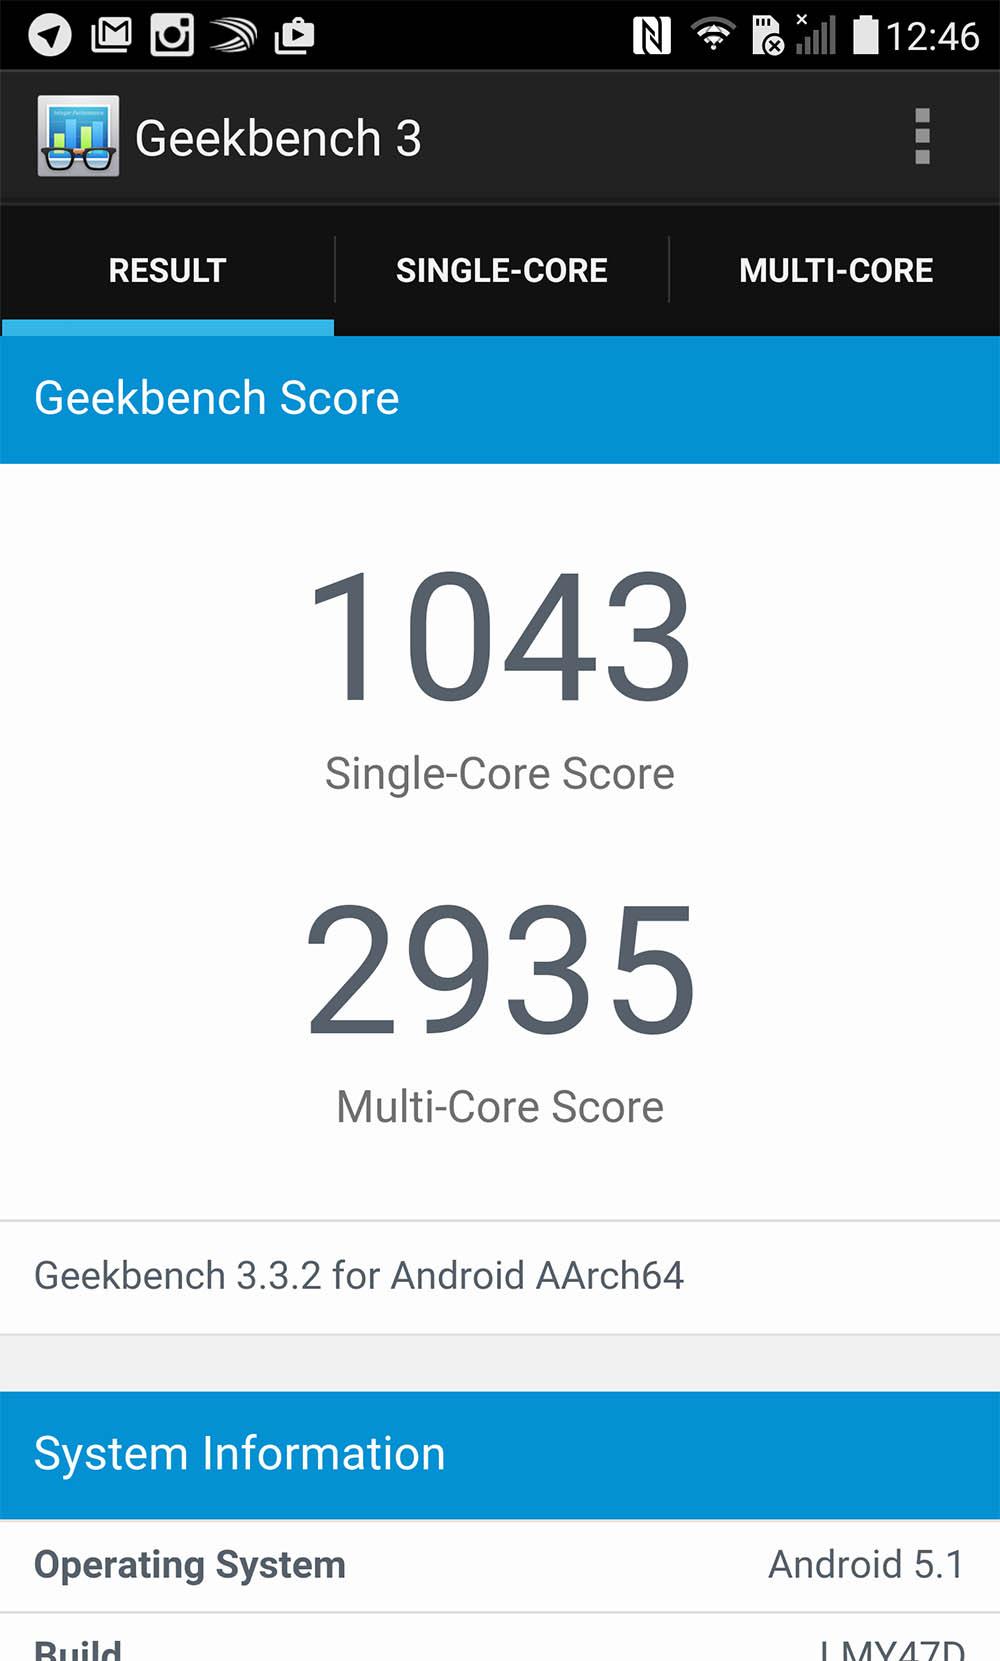 LG G4 Geekbench